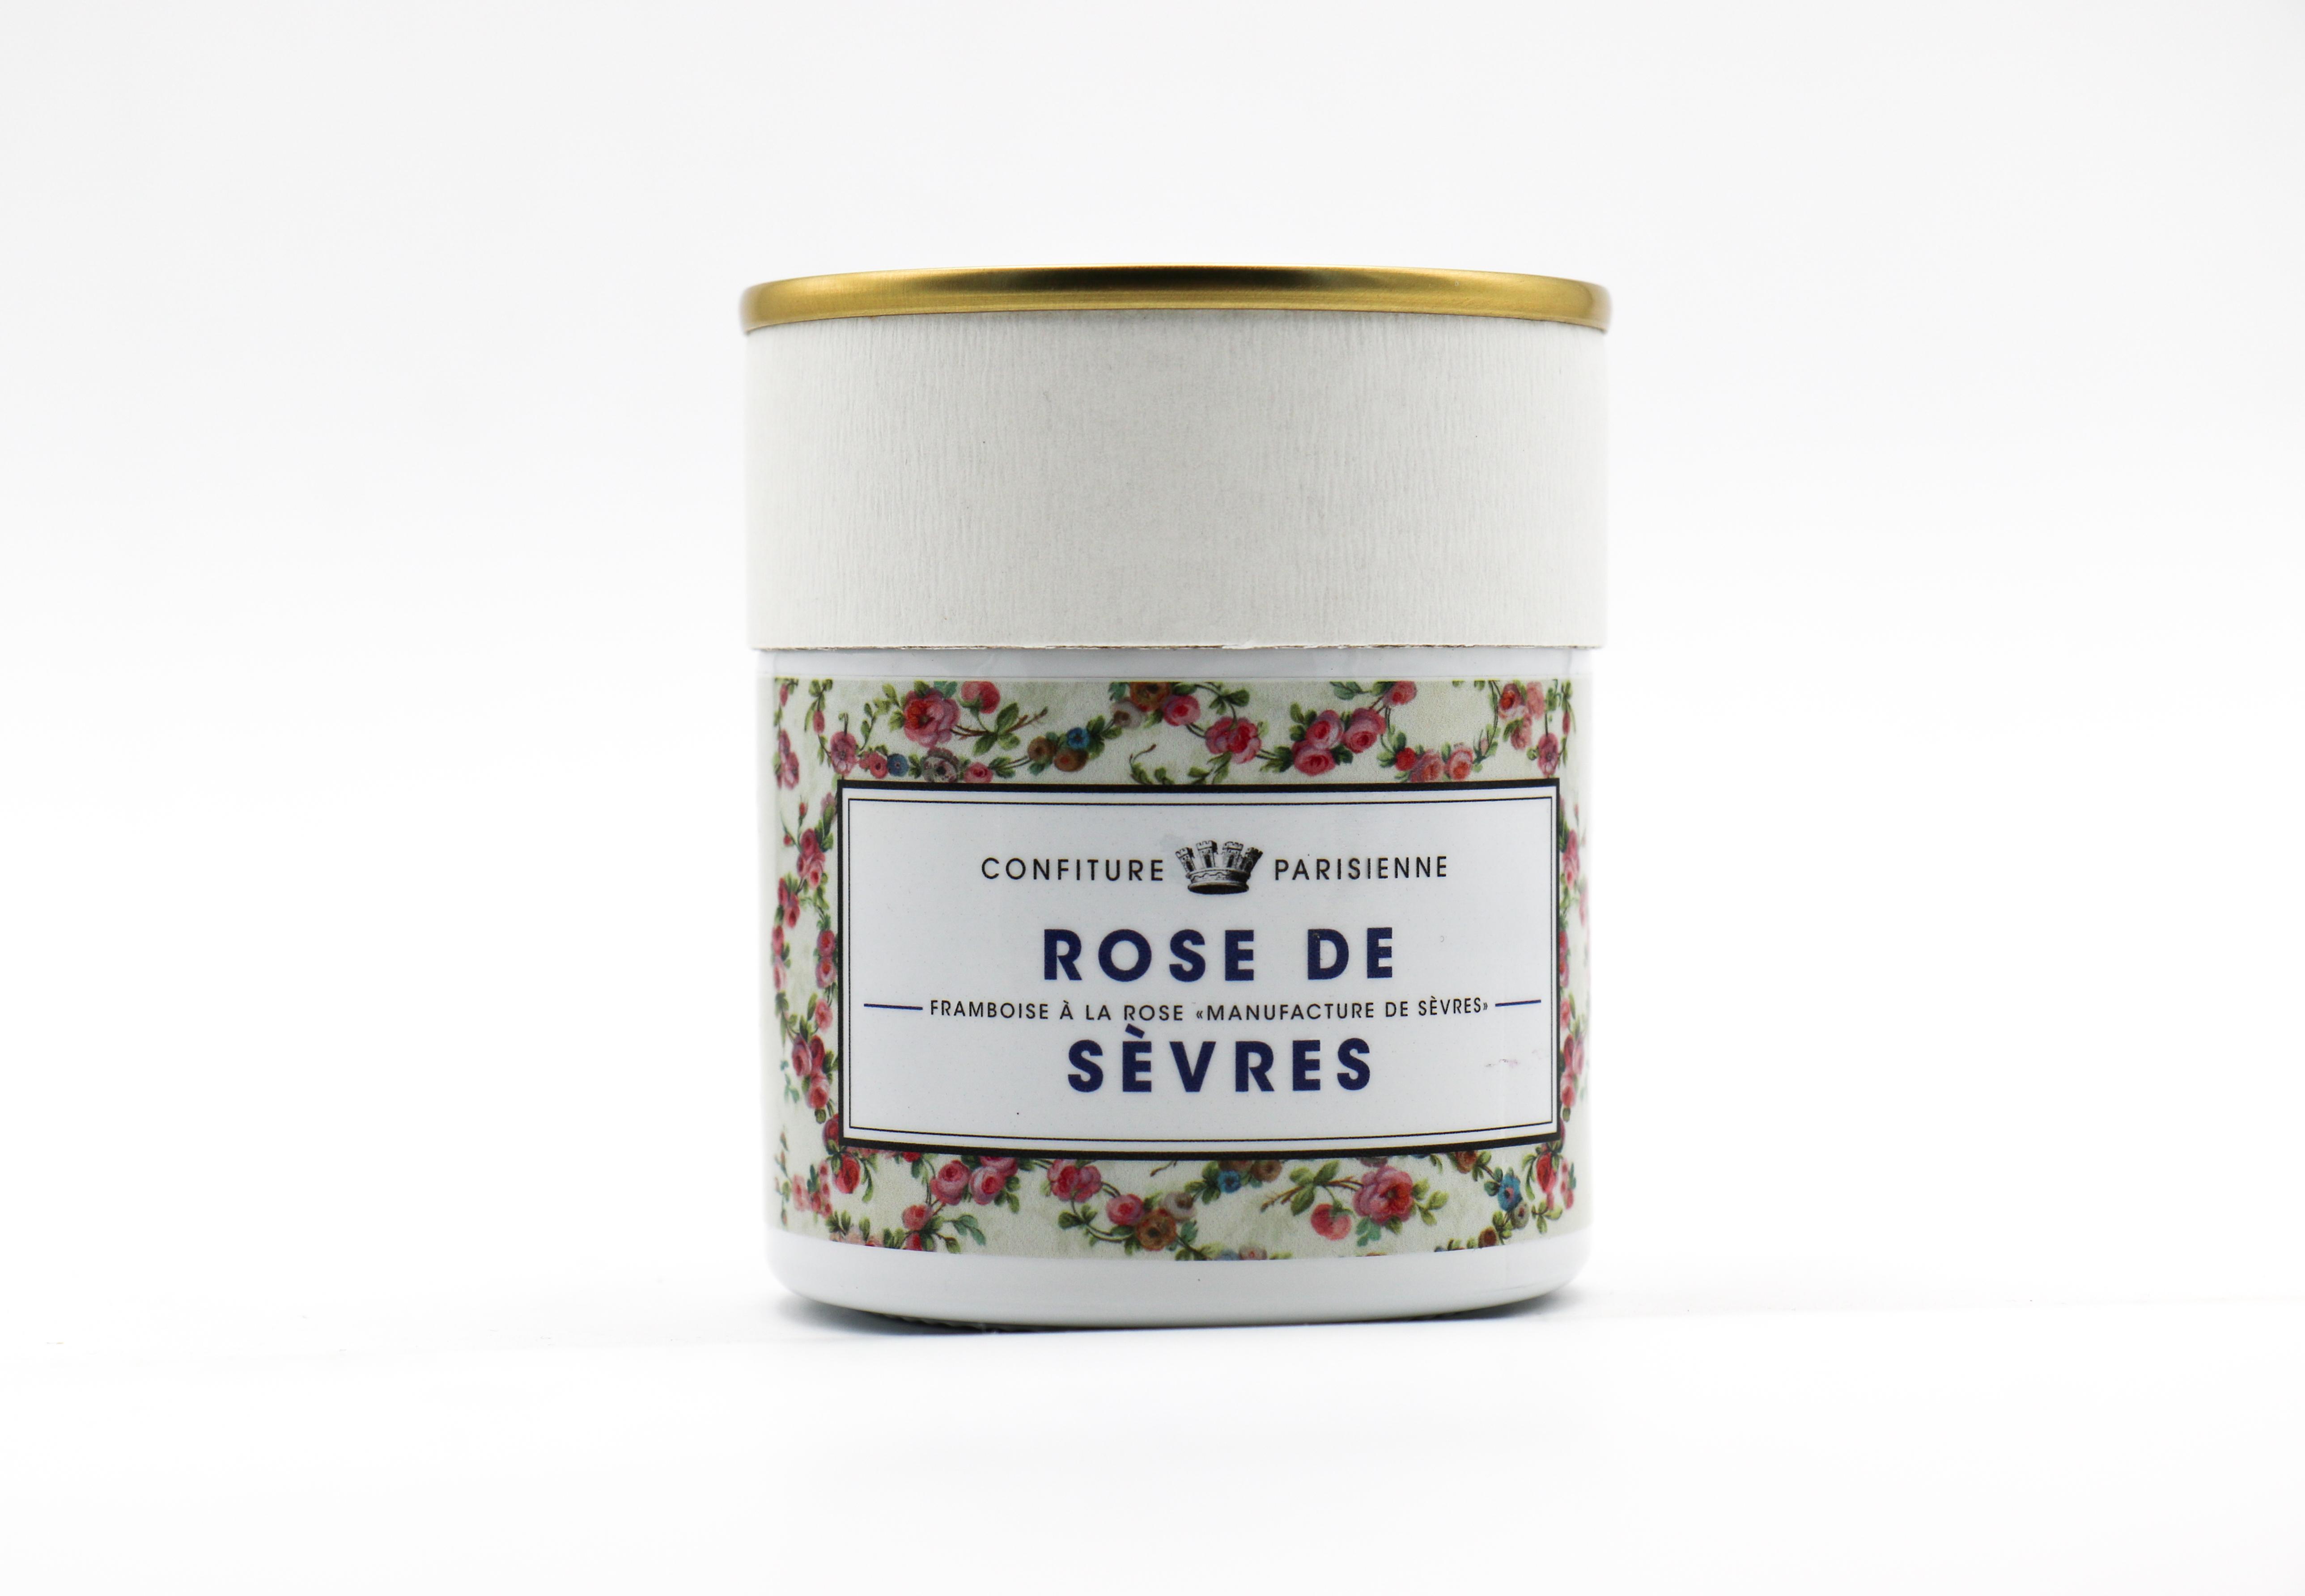 CONFITURE PARISIENNE ROSE DE SEVRES (RASBERRY & ROSE)